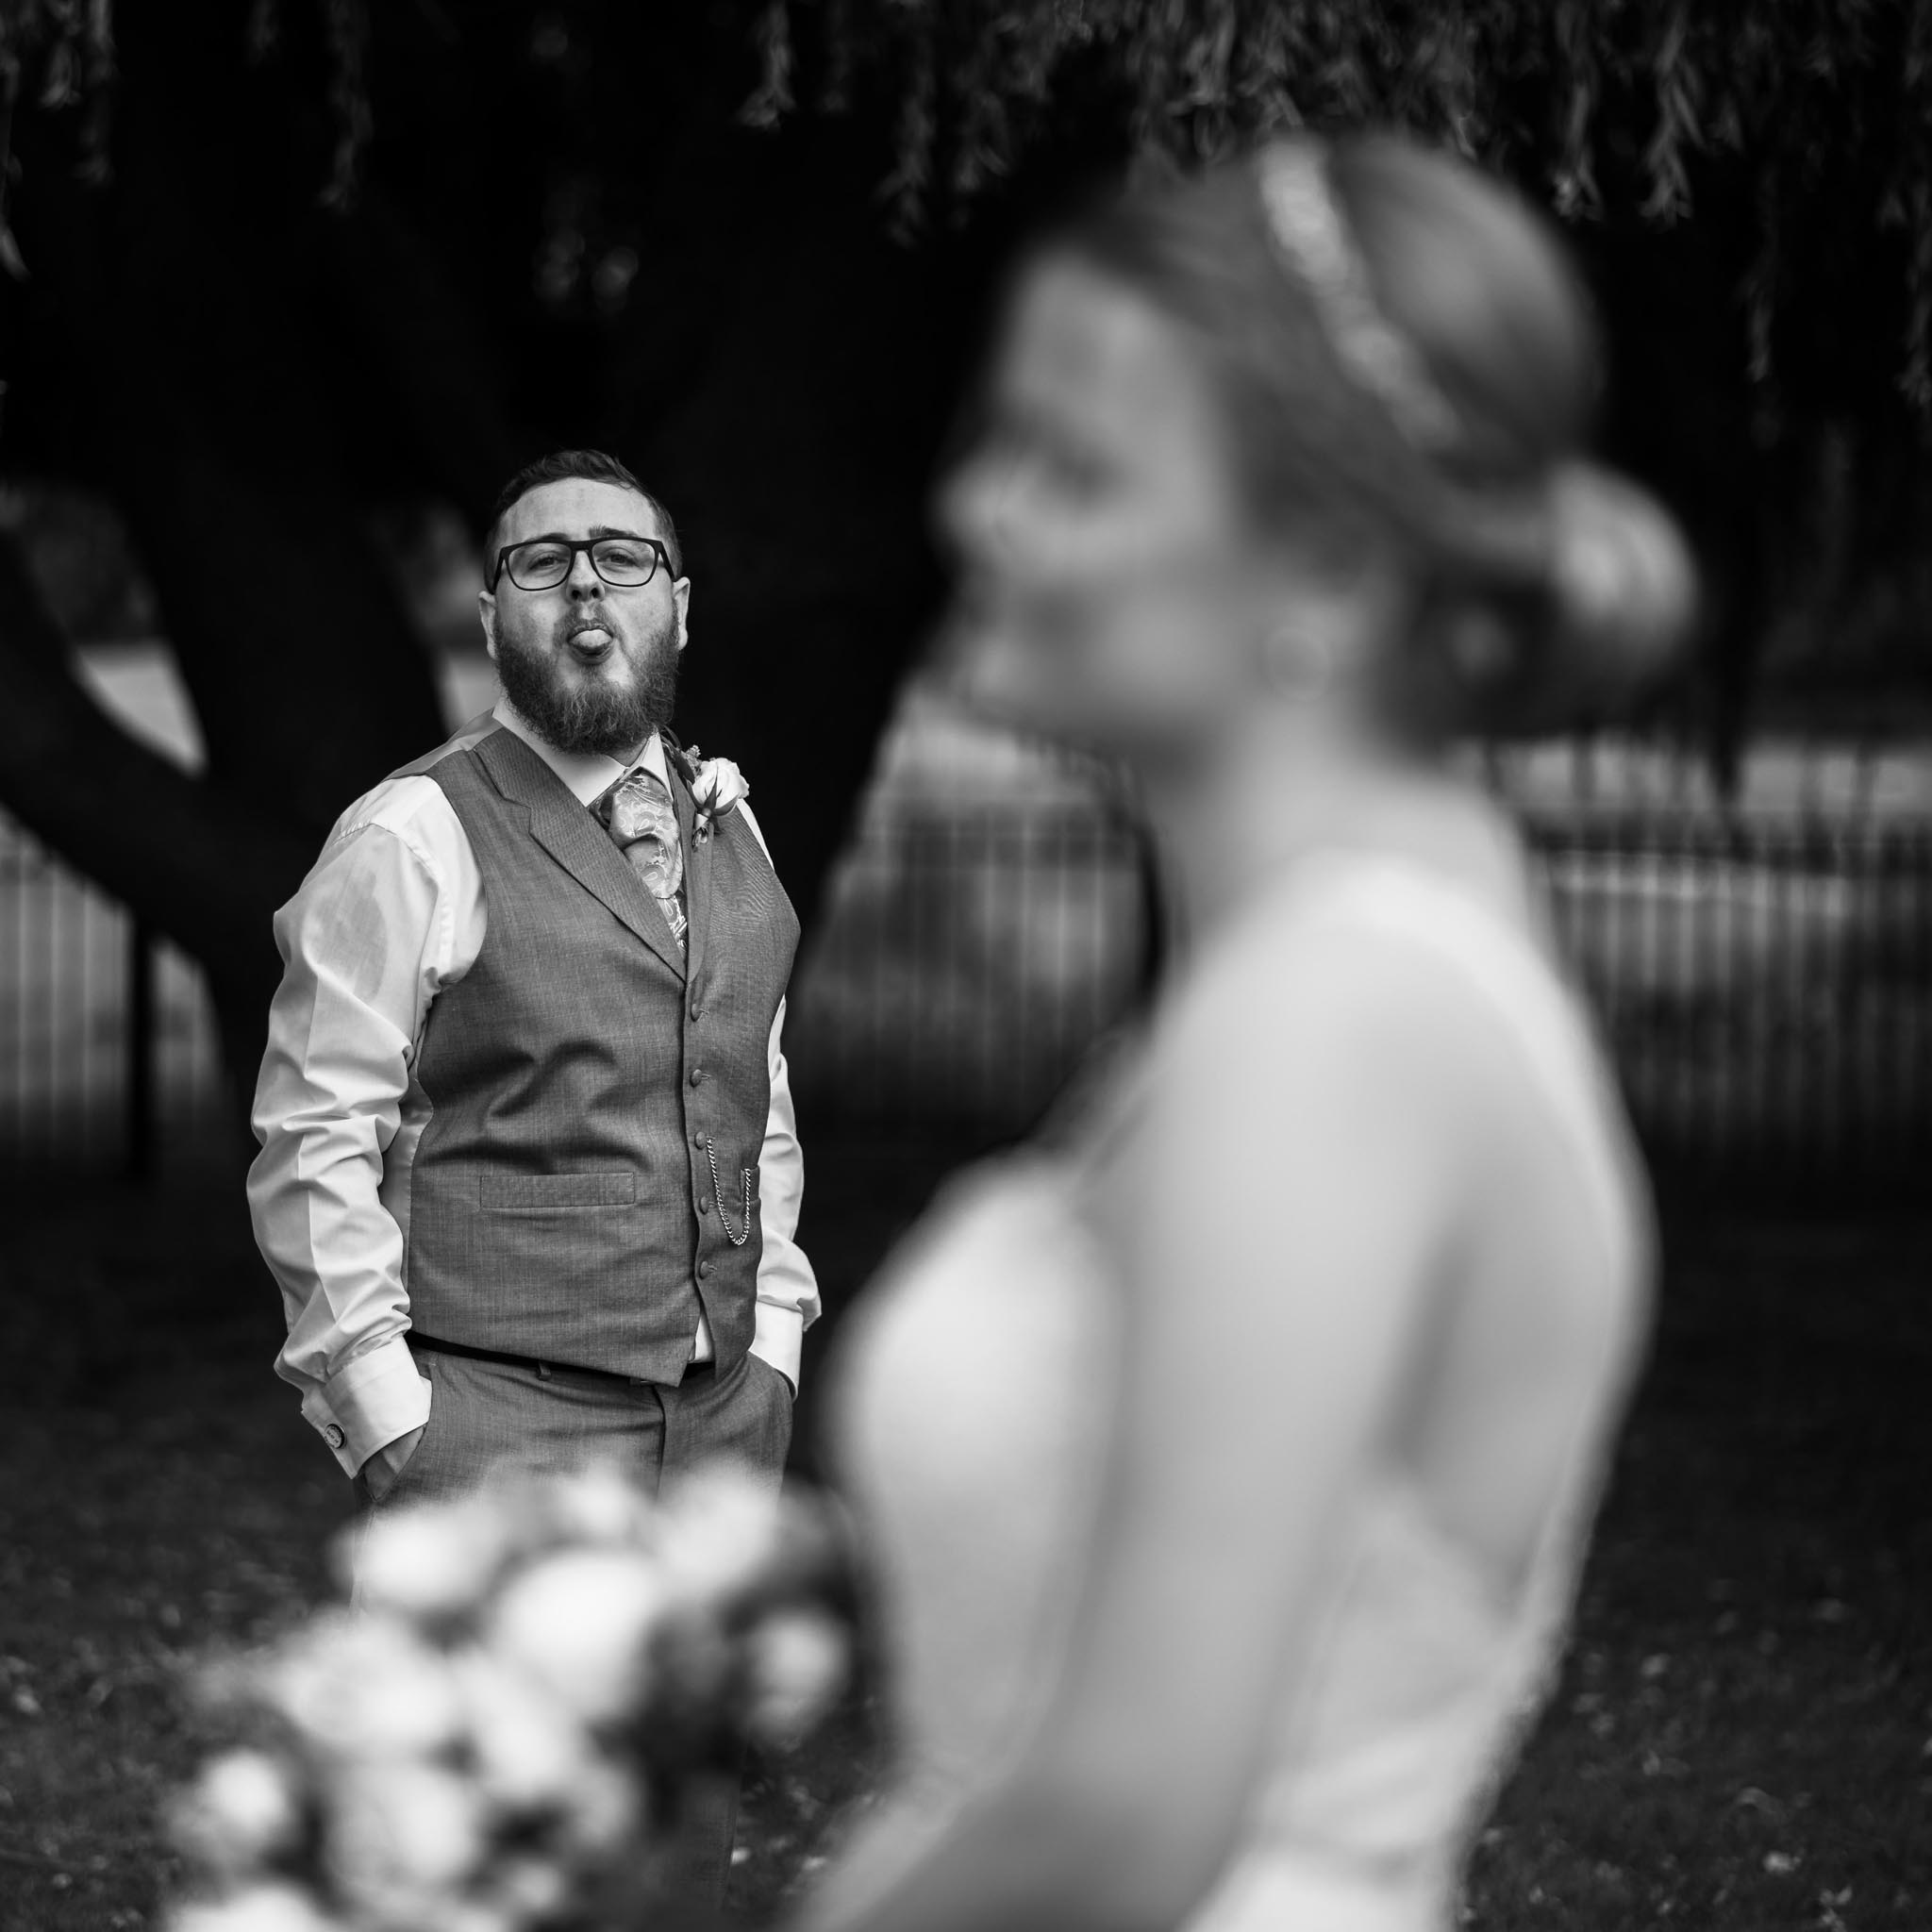 557-Bride-groom-Luke-Yasmin-The-Rayleigh-Club-Wedding-Photography.jpg